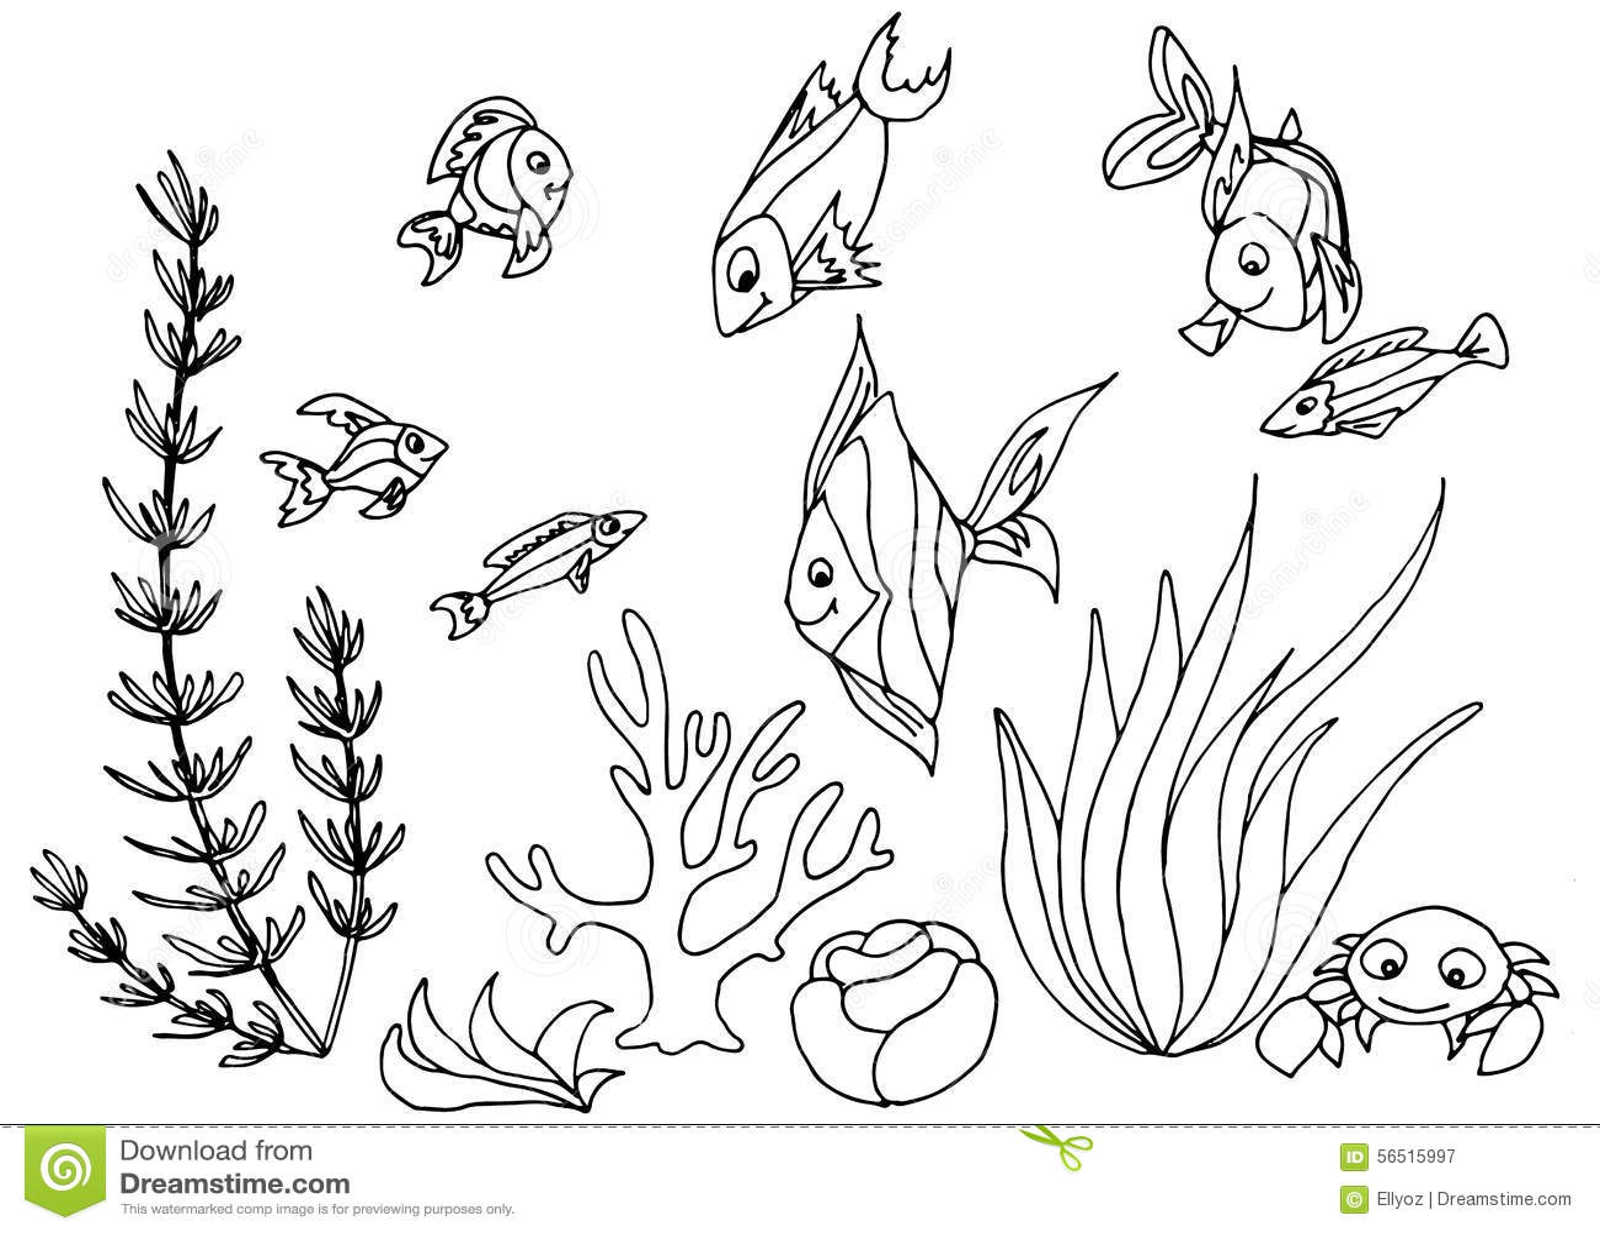 fish aquarium decorations coloring pages | Tropical Fish Hand Drawn Design Set. Stock Vector ...